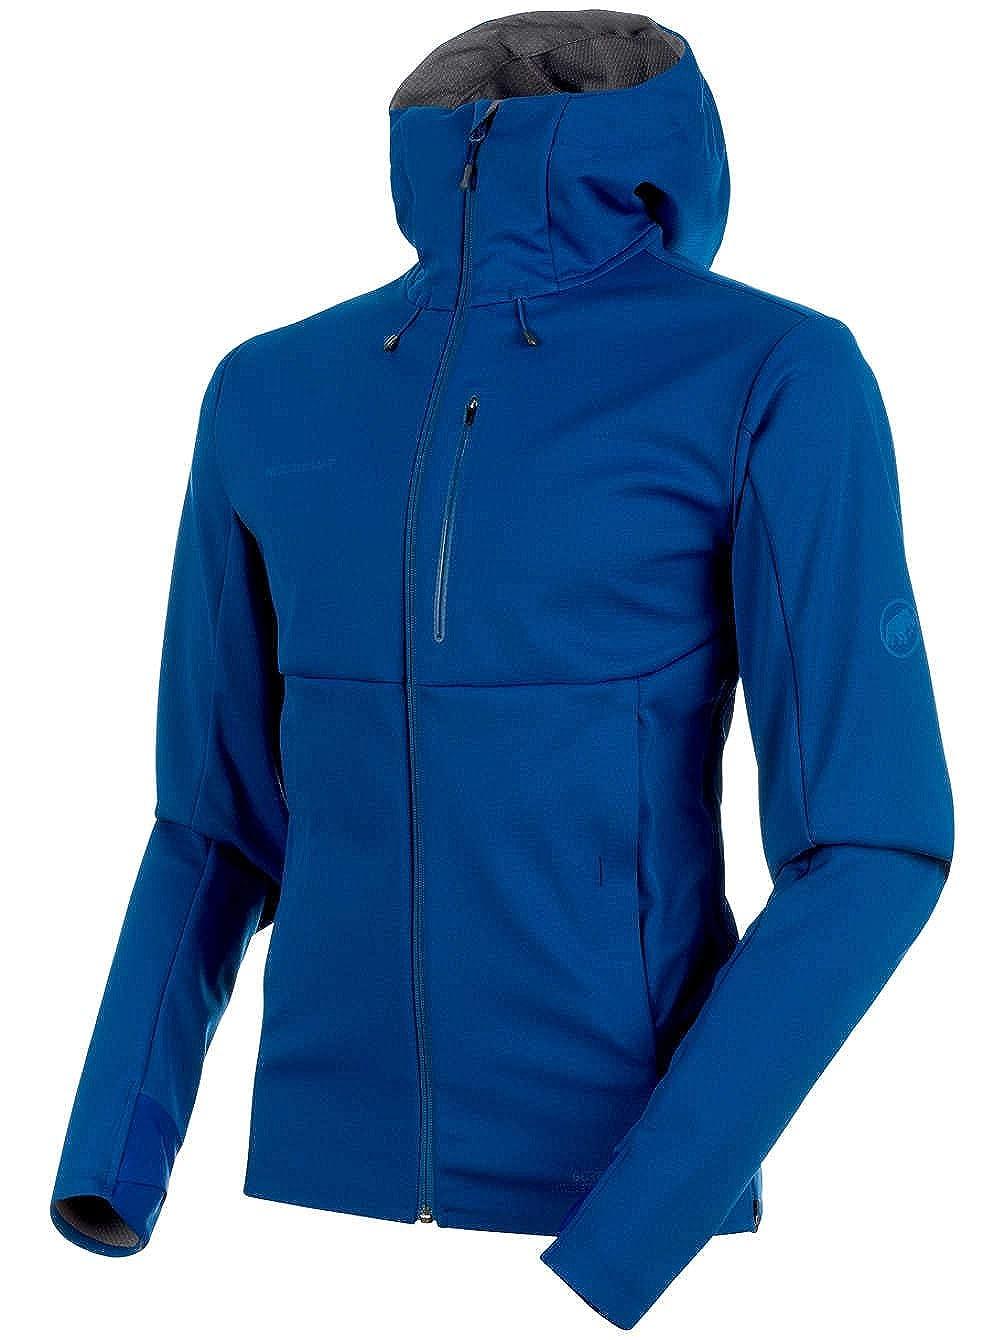 Ultramarine-Titanium Melange L Mammut Men's Ultimate V Softshell Jackets